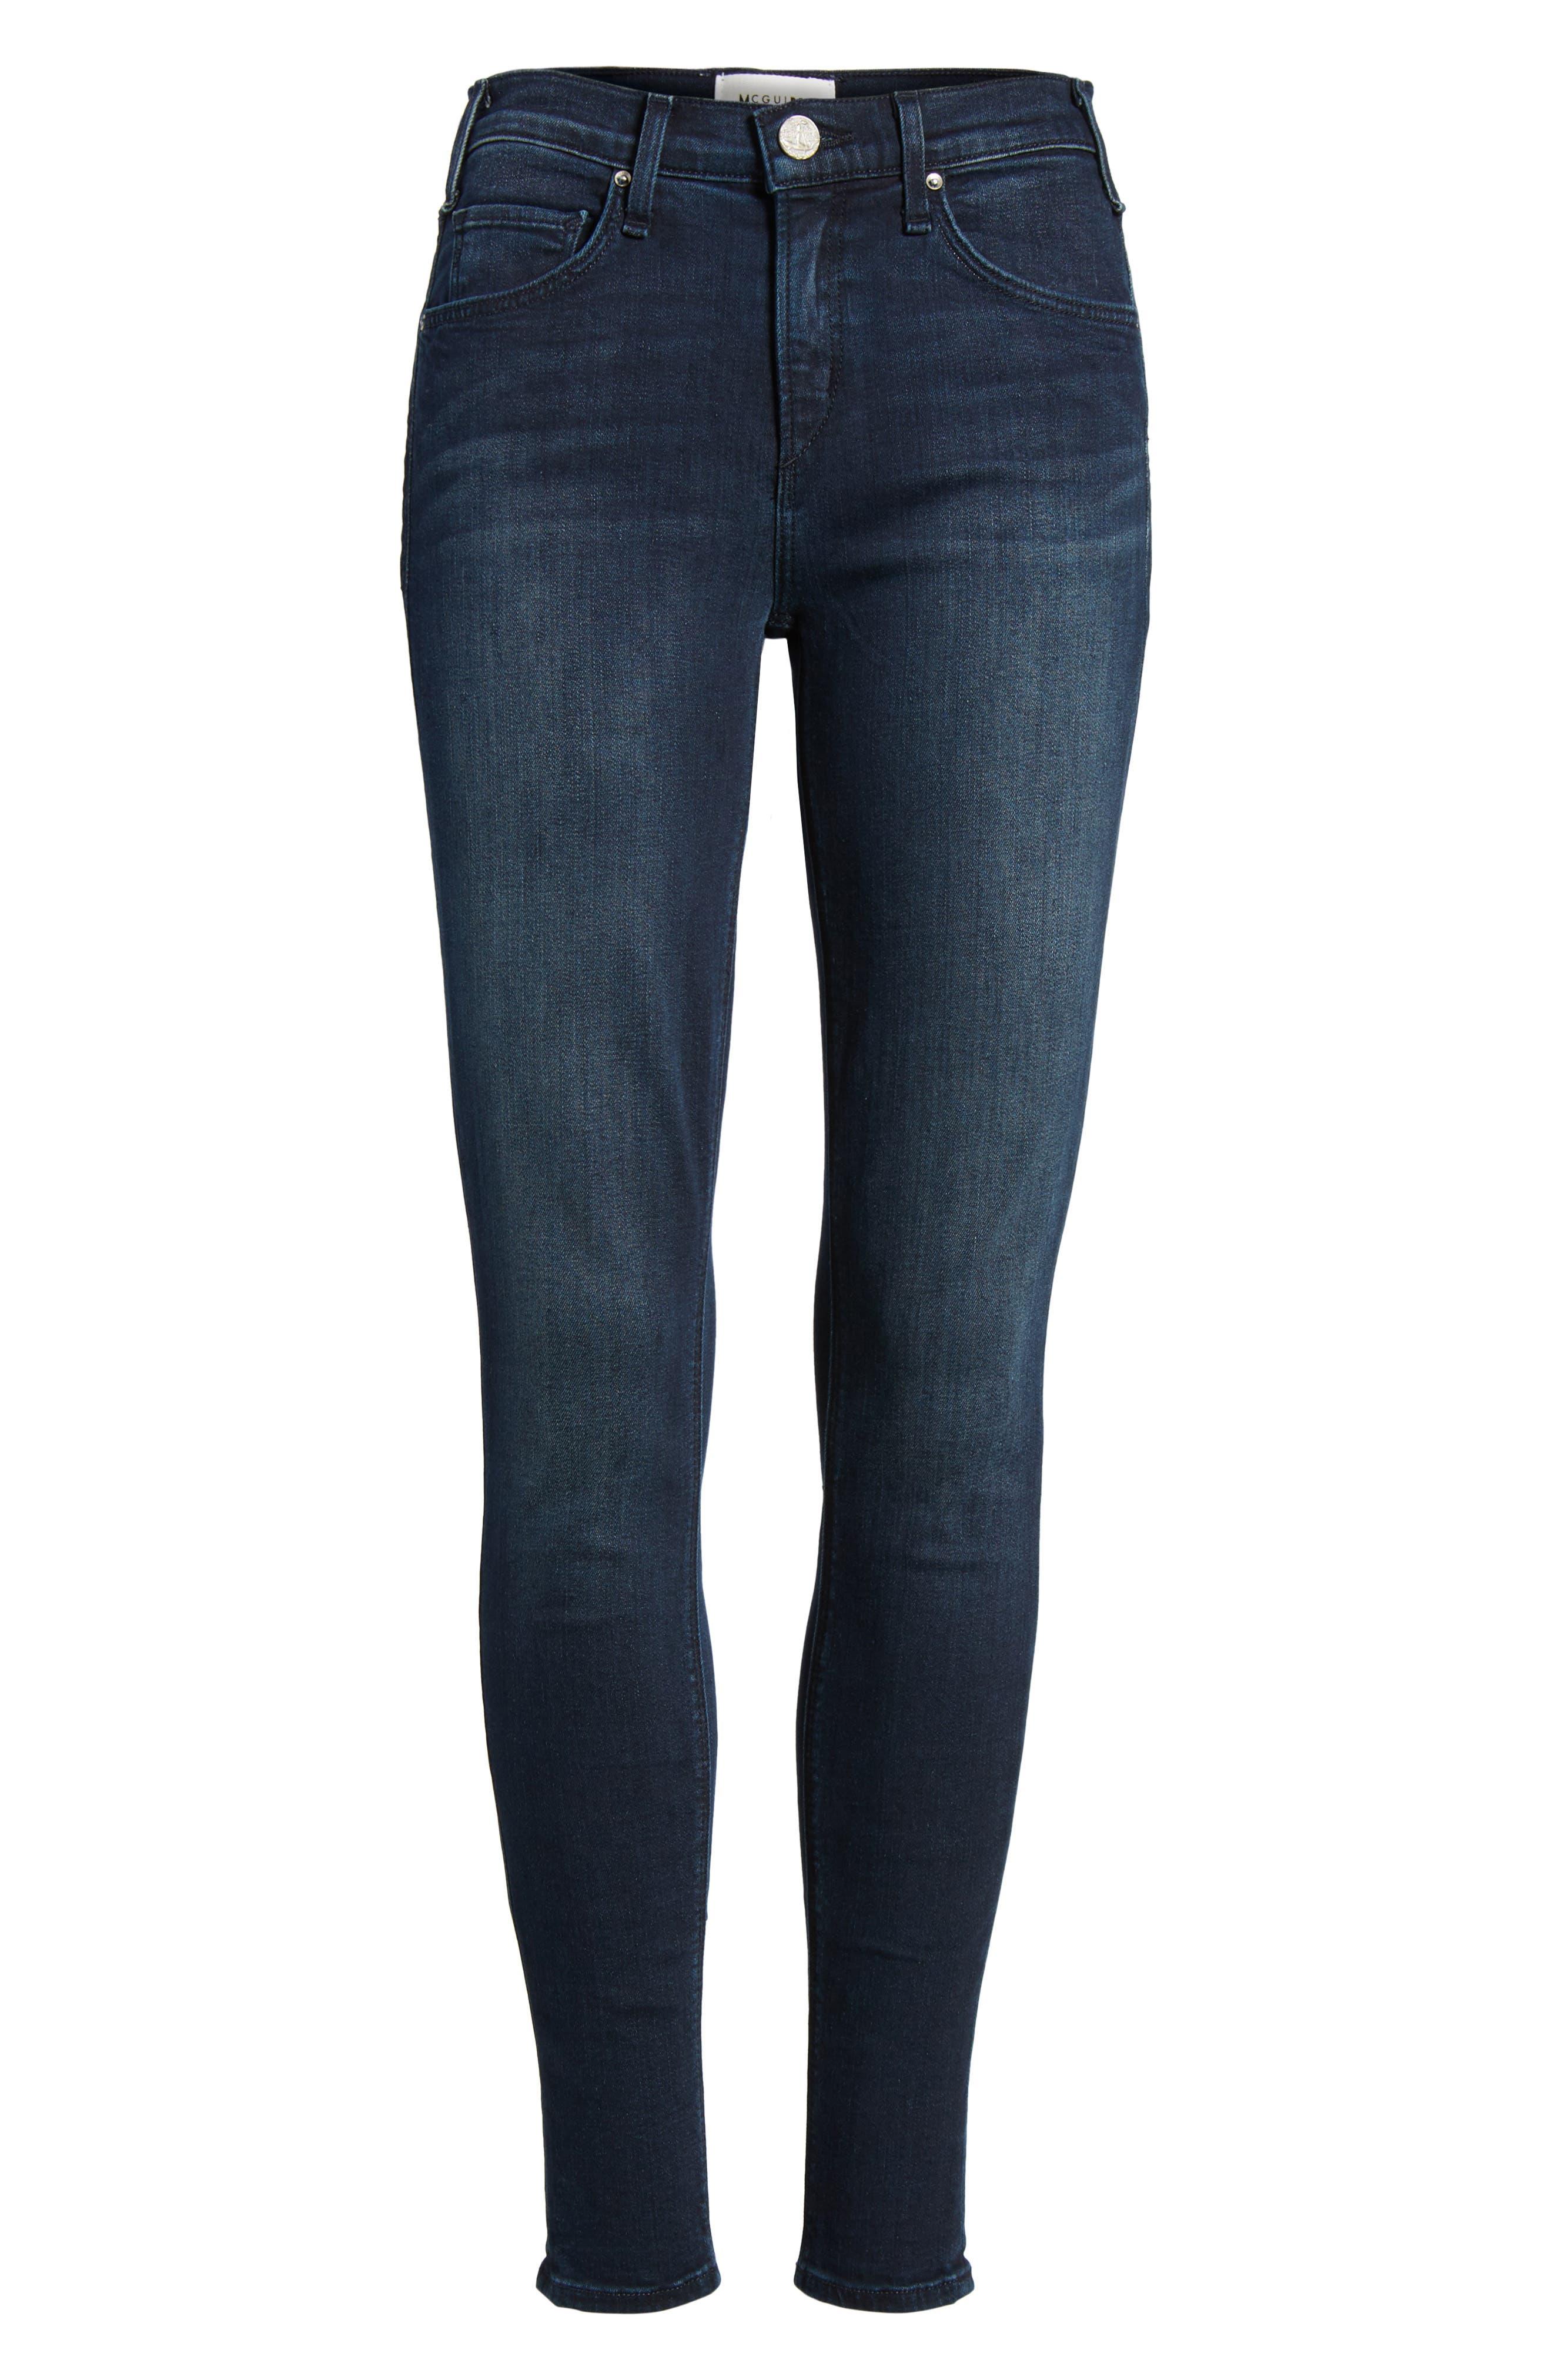 Newton Skinny Jeans,                             Alternate thumbnail 6, color,                             410